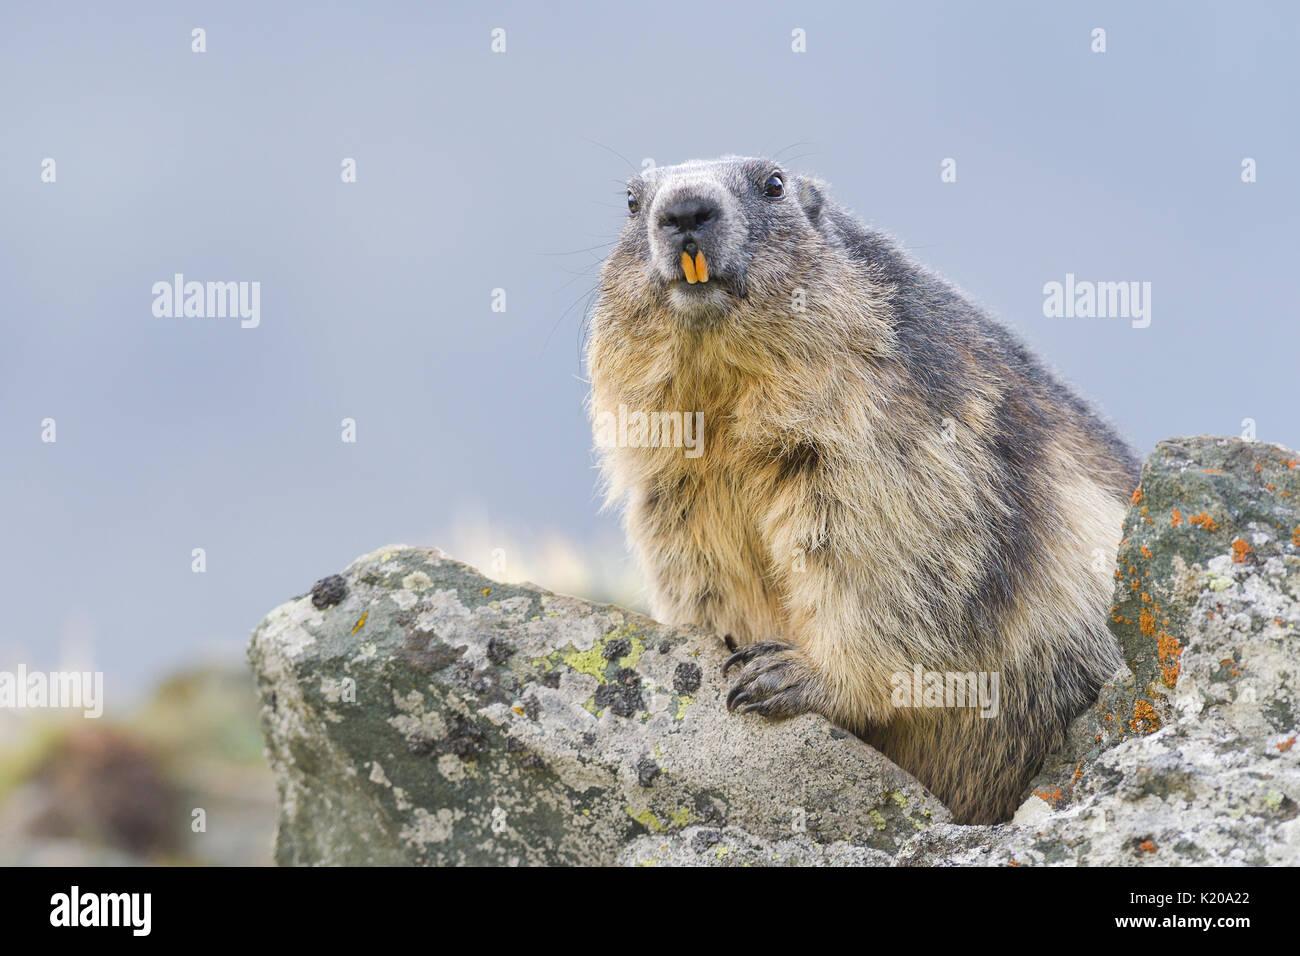 La marmota alpina (Marmota marmota) en rocas, animales retrato, parque nacional Hohe Tauern, Carintia, Austria Imagen De Stock